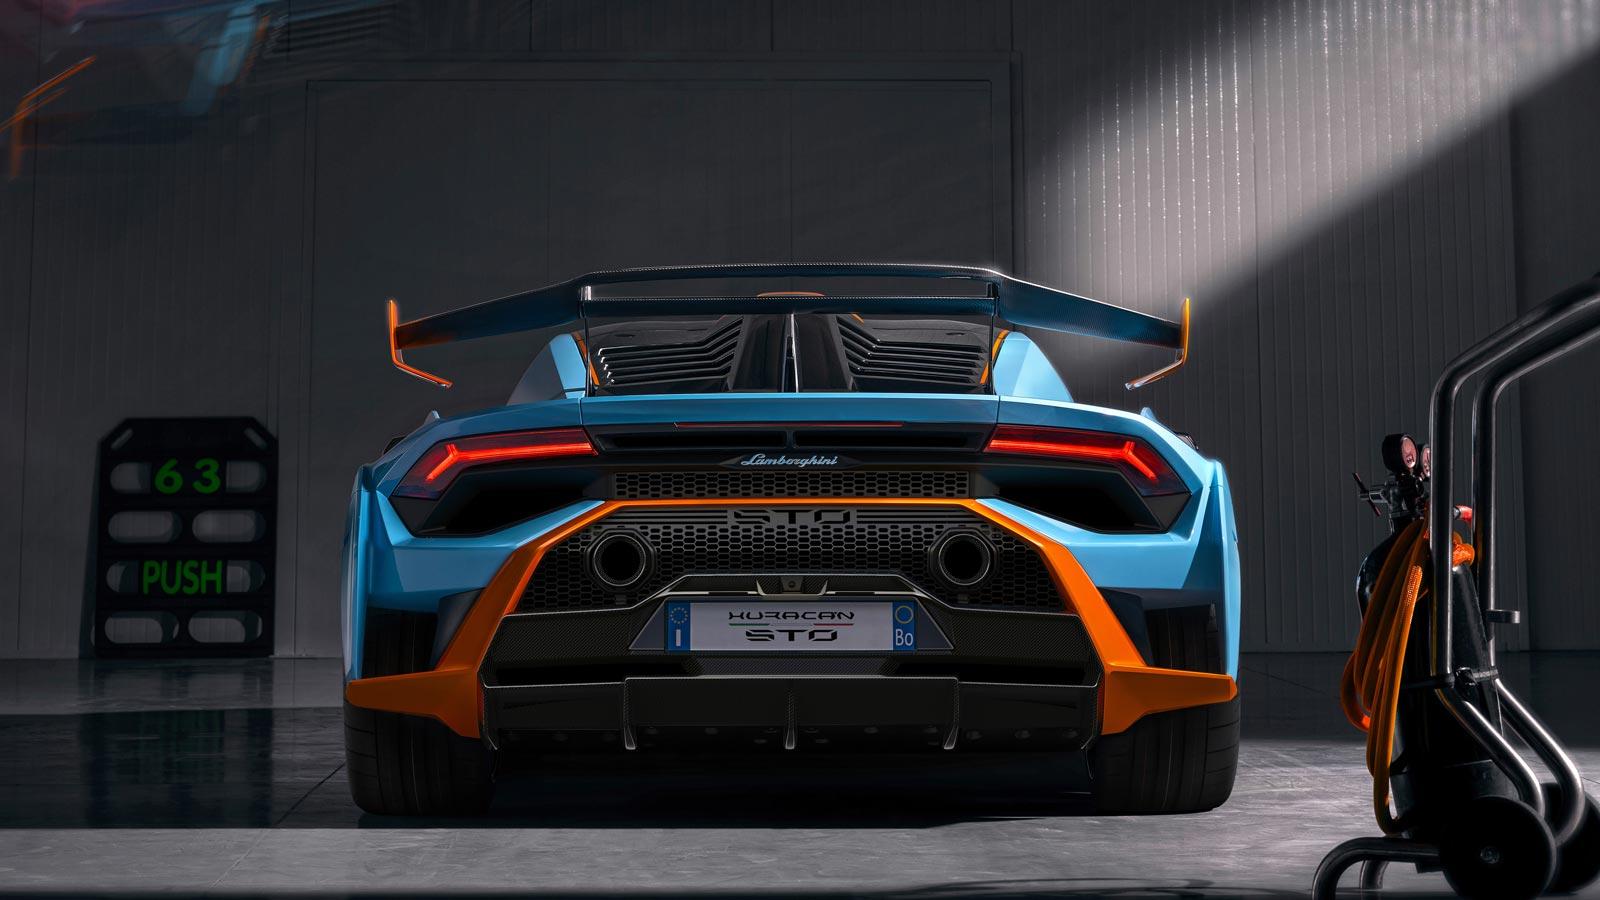 Lamborghini Huracan STO - From racetrack to road image 5